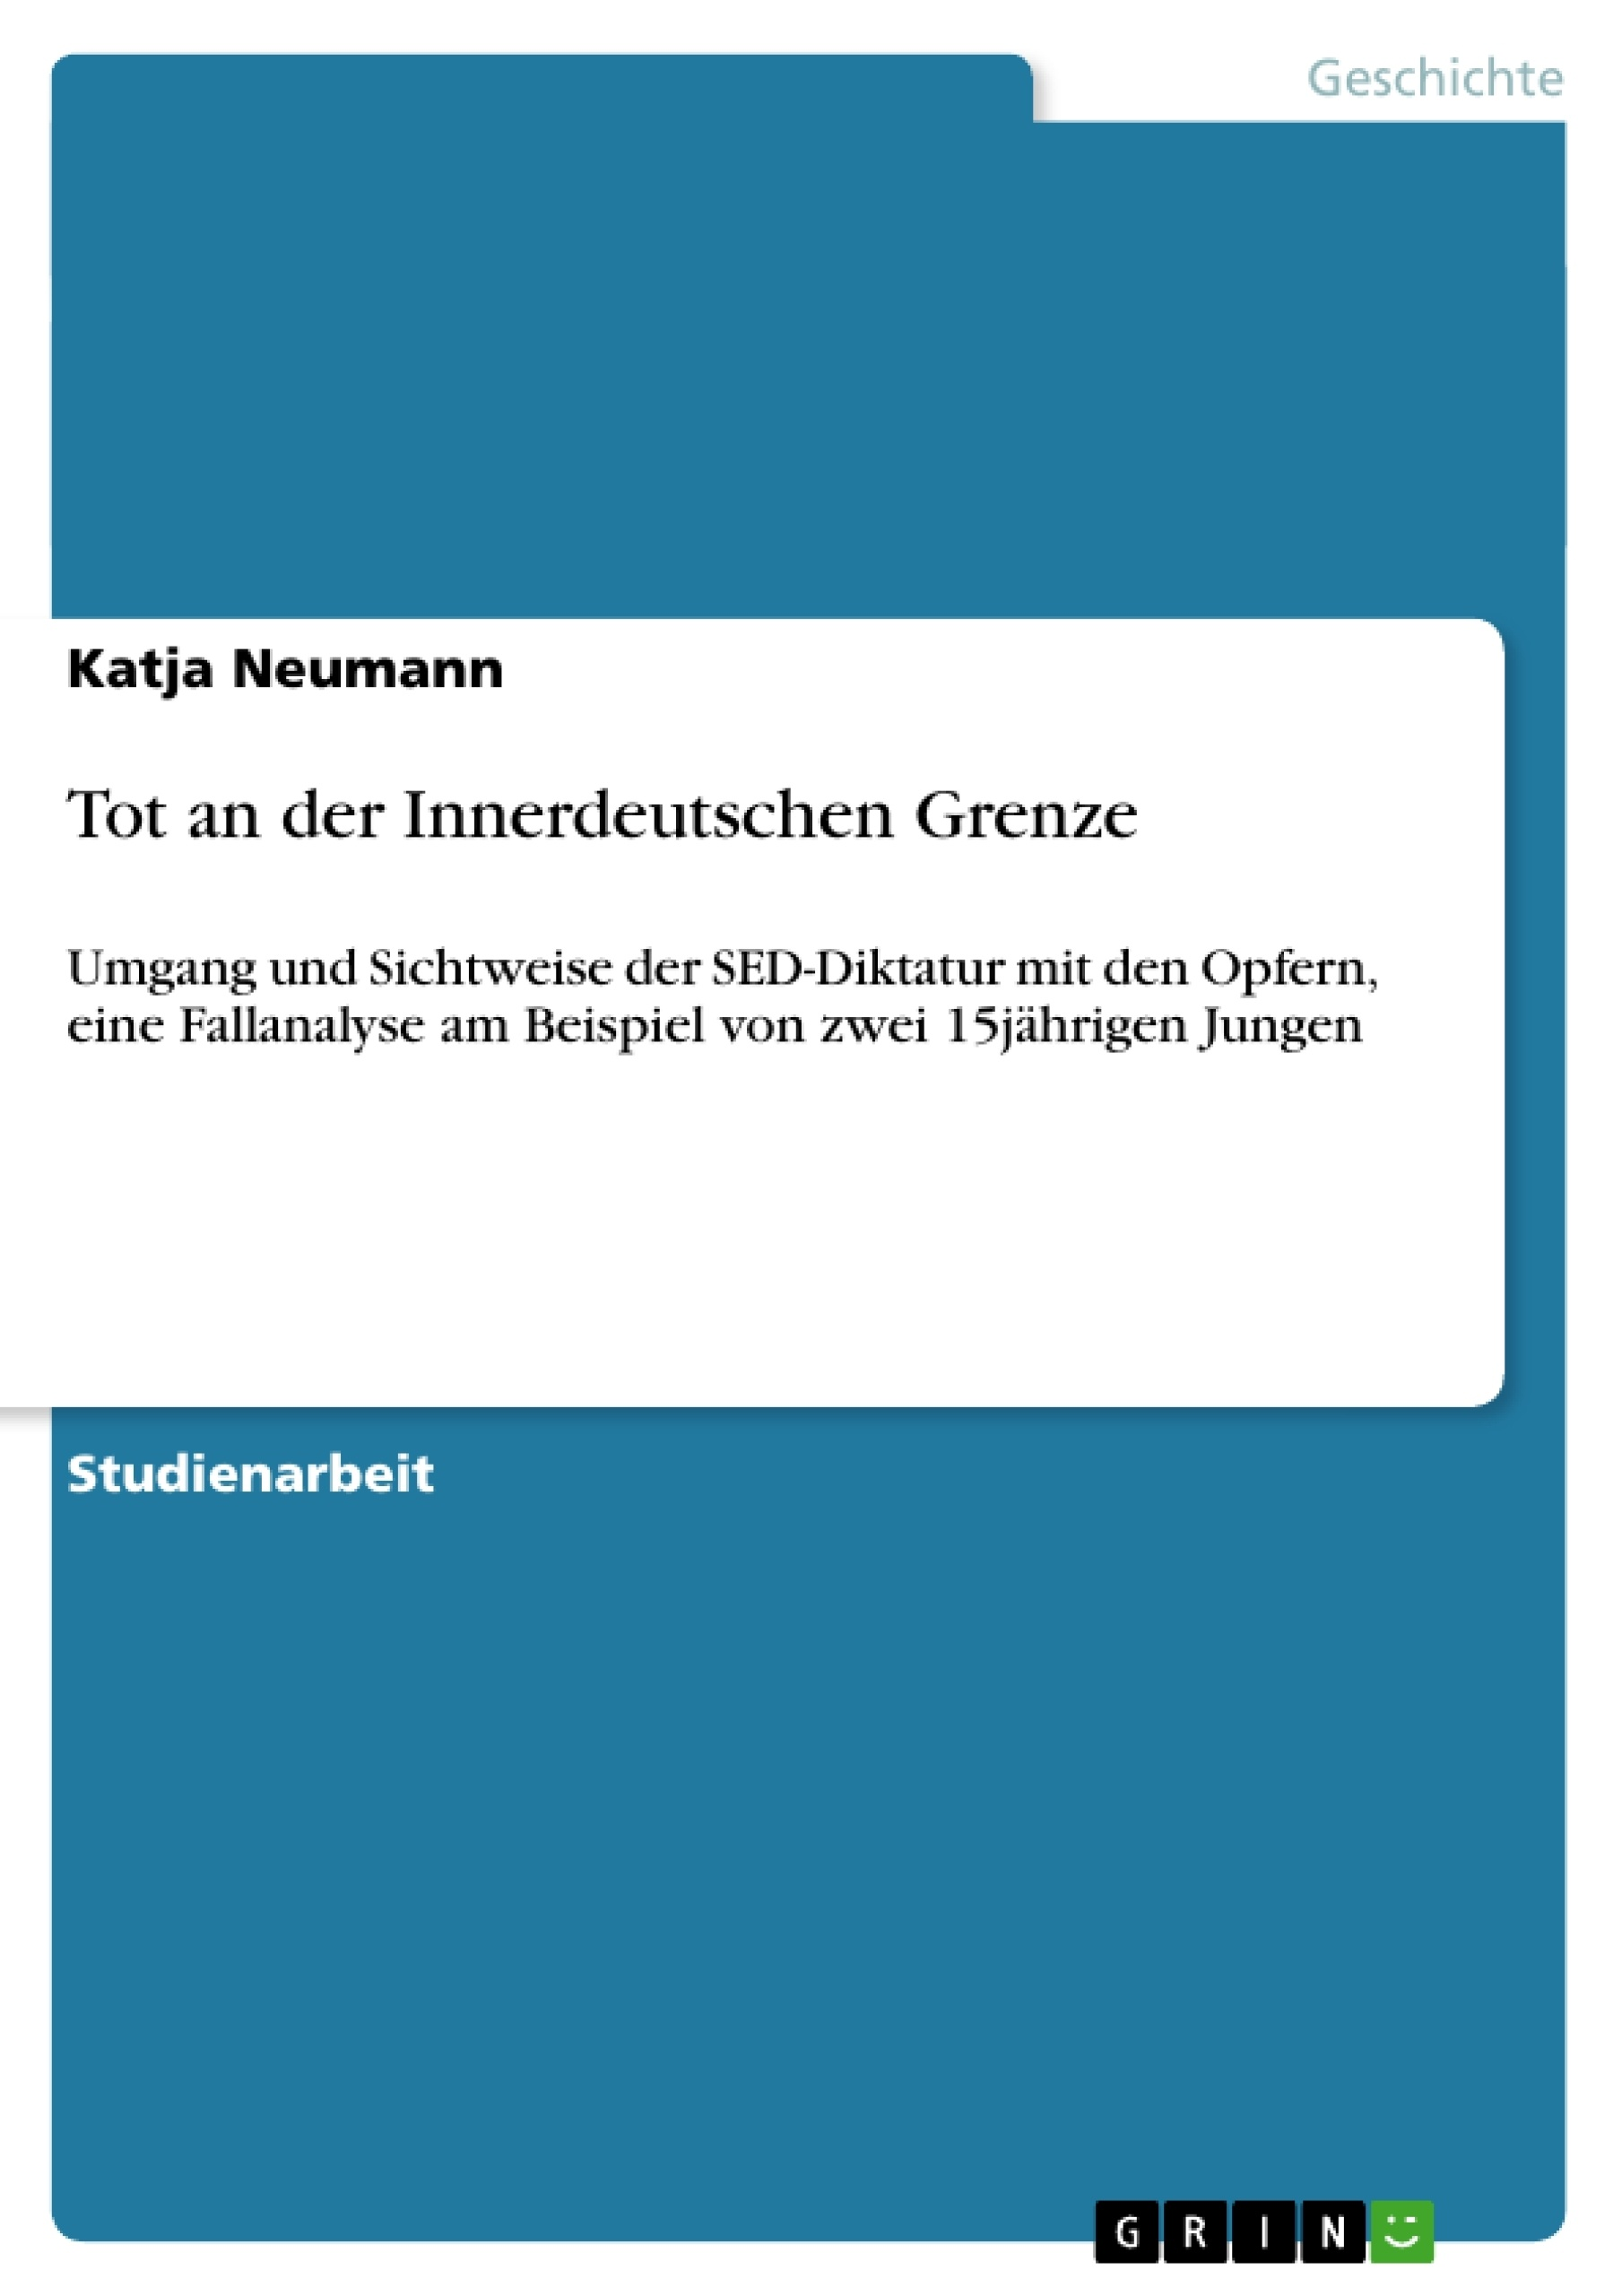 Titel: Tot an der Innerdeutschen Grenze